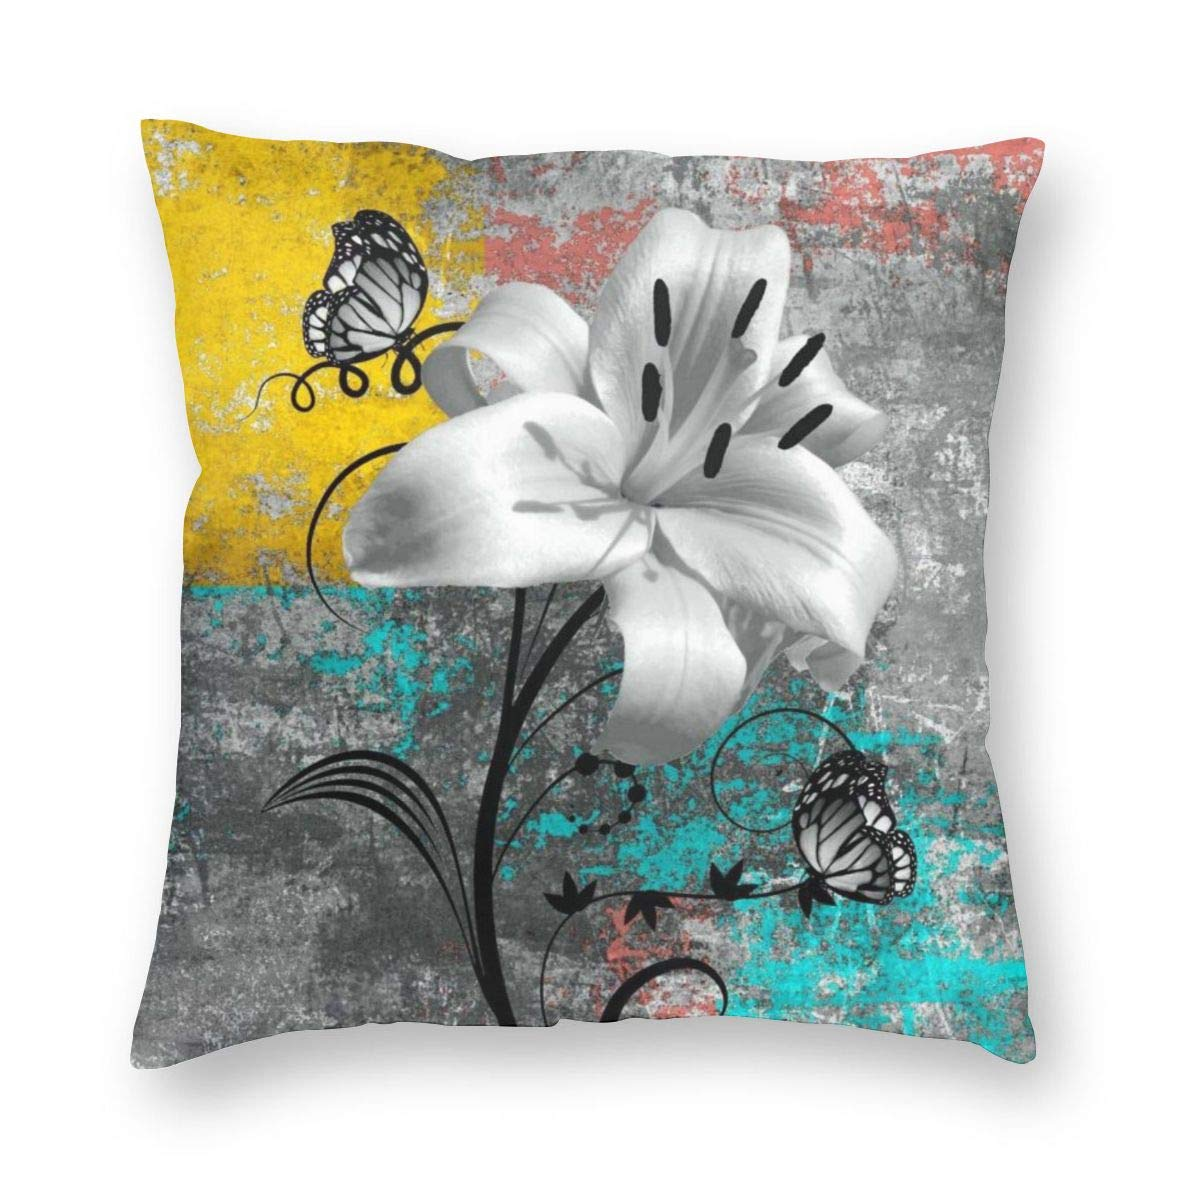 Stupendous Amazon Com Mostico Nachill Throw Pillows Case Grey Gold Beatyapartments Chair Design Images Beatyapartmentscom